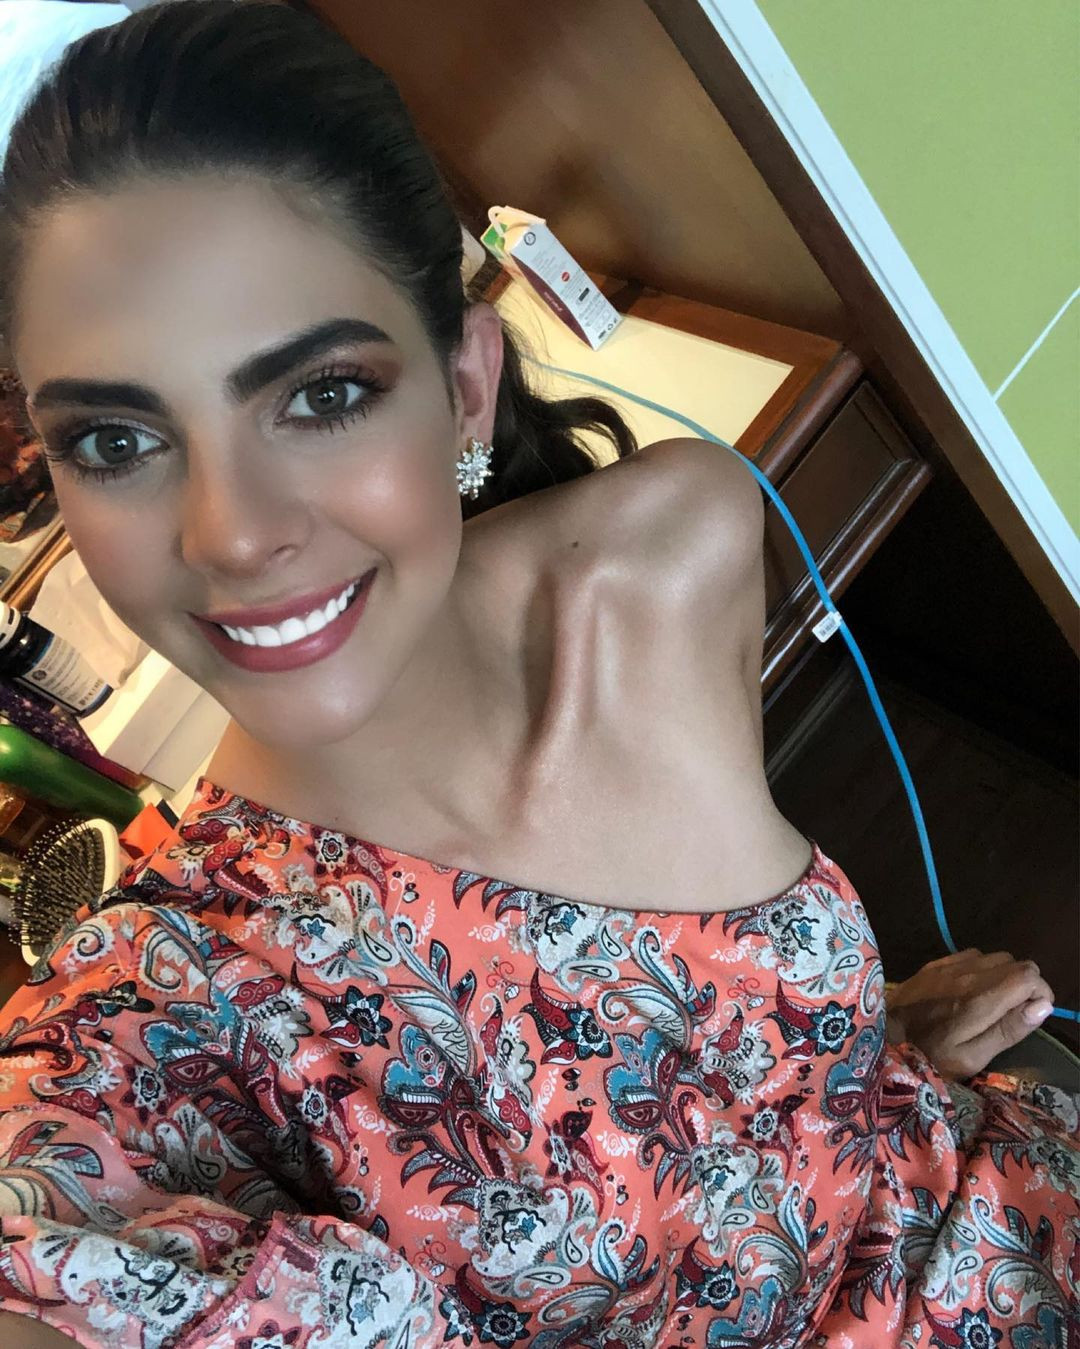 natalia manrique, miss grand colombia 2020. - Página 5 Q2nvag10